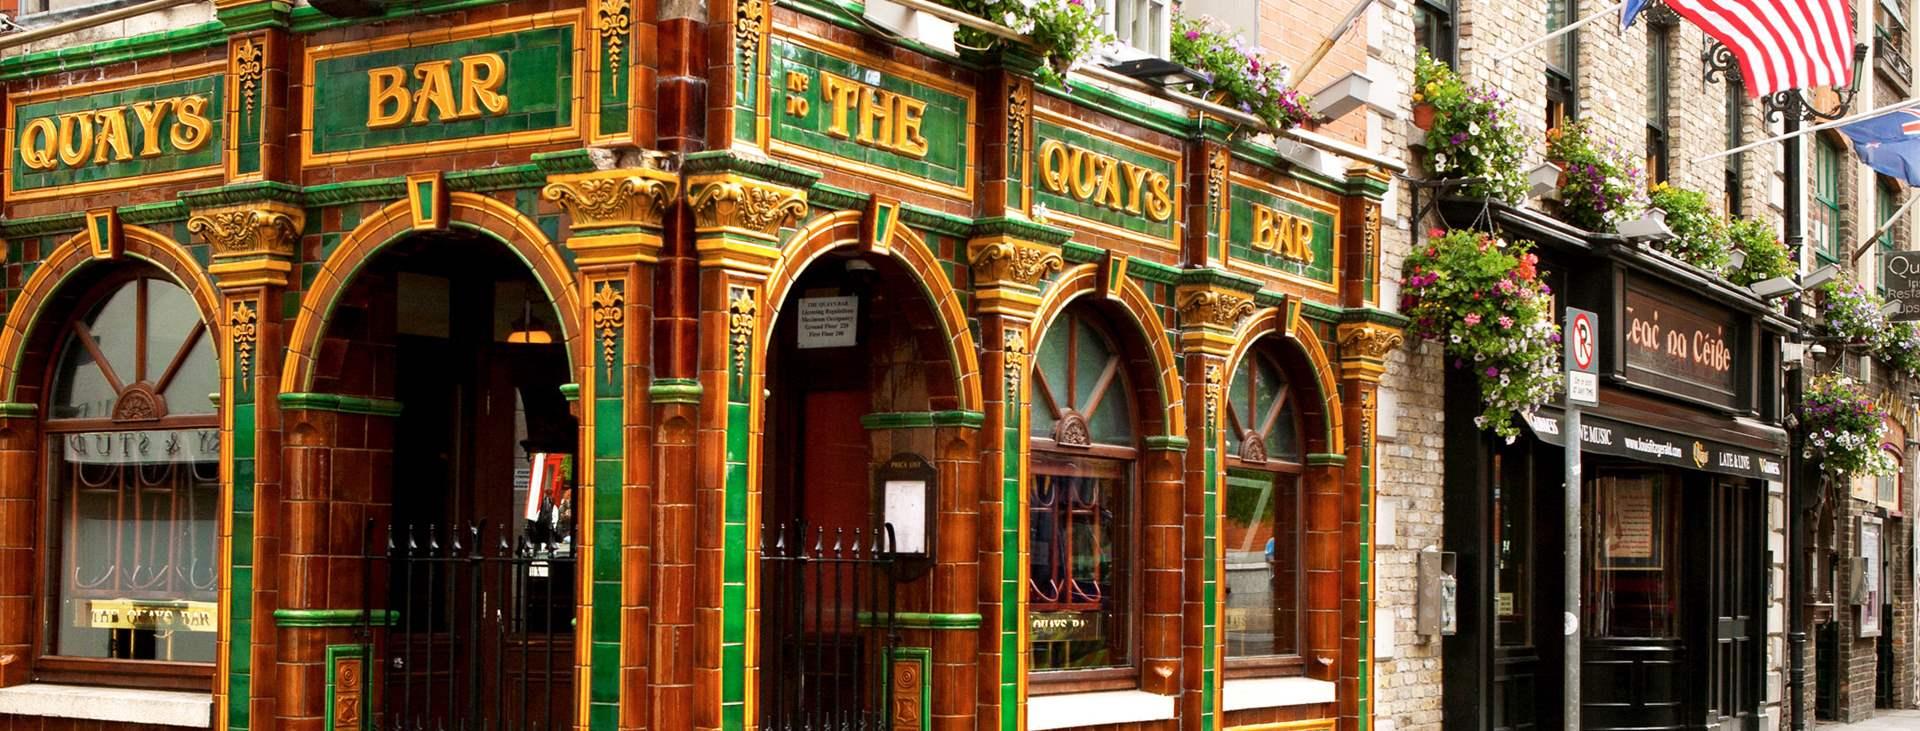 Baarialue Temple Bar, Dublin